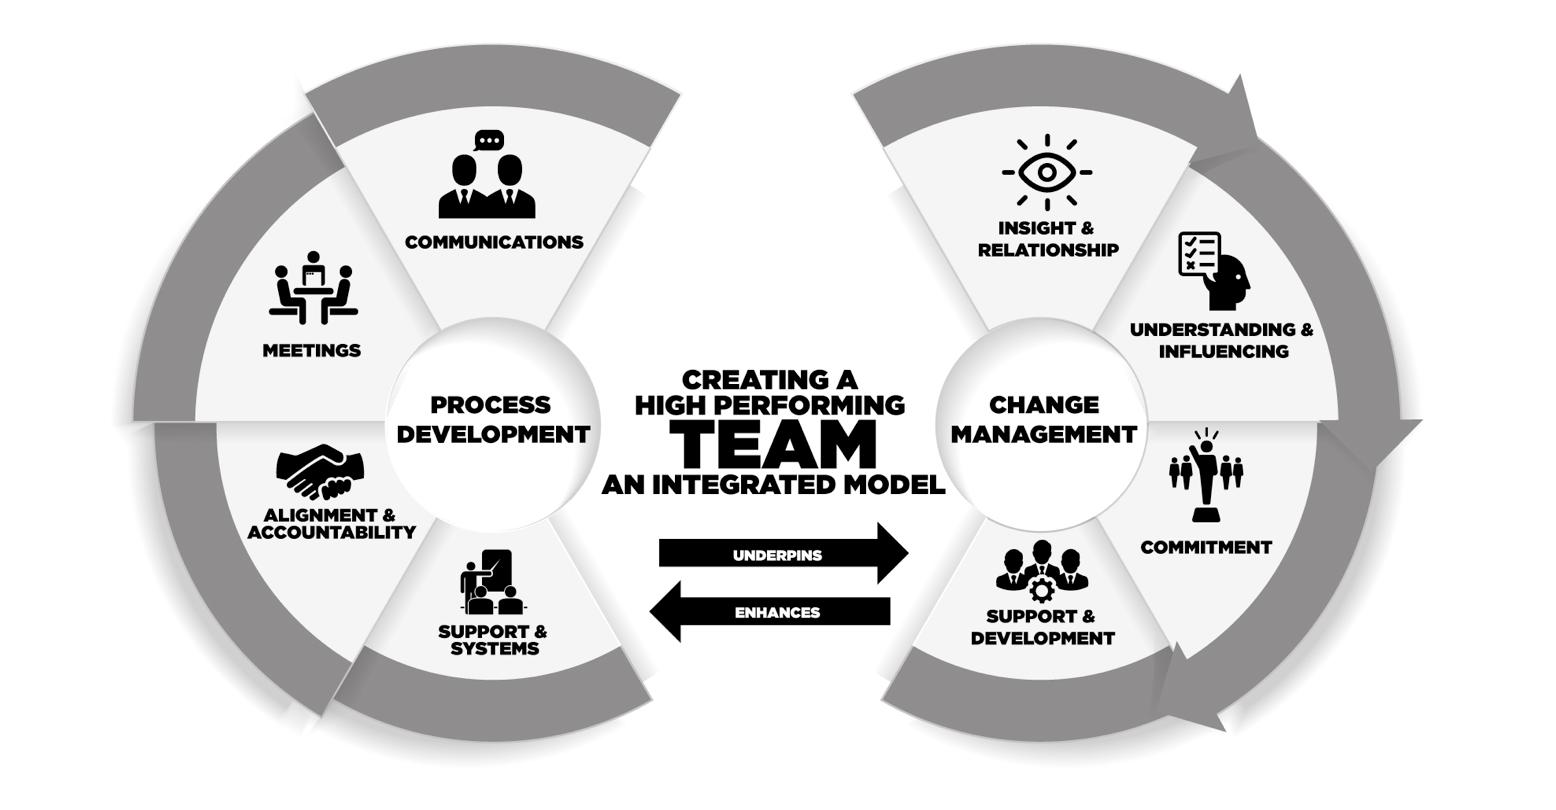 High performing team model